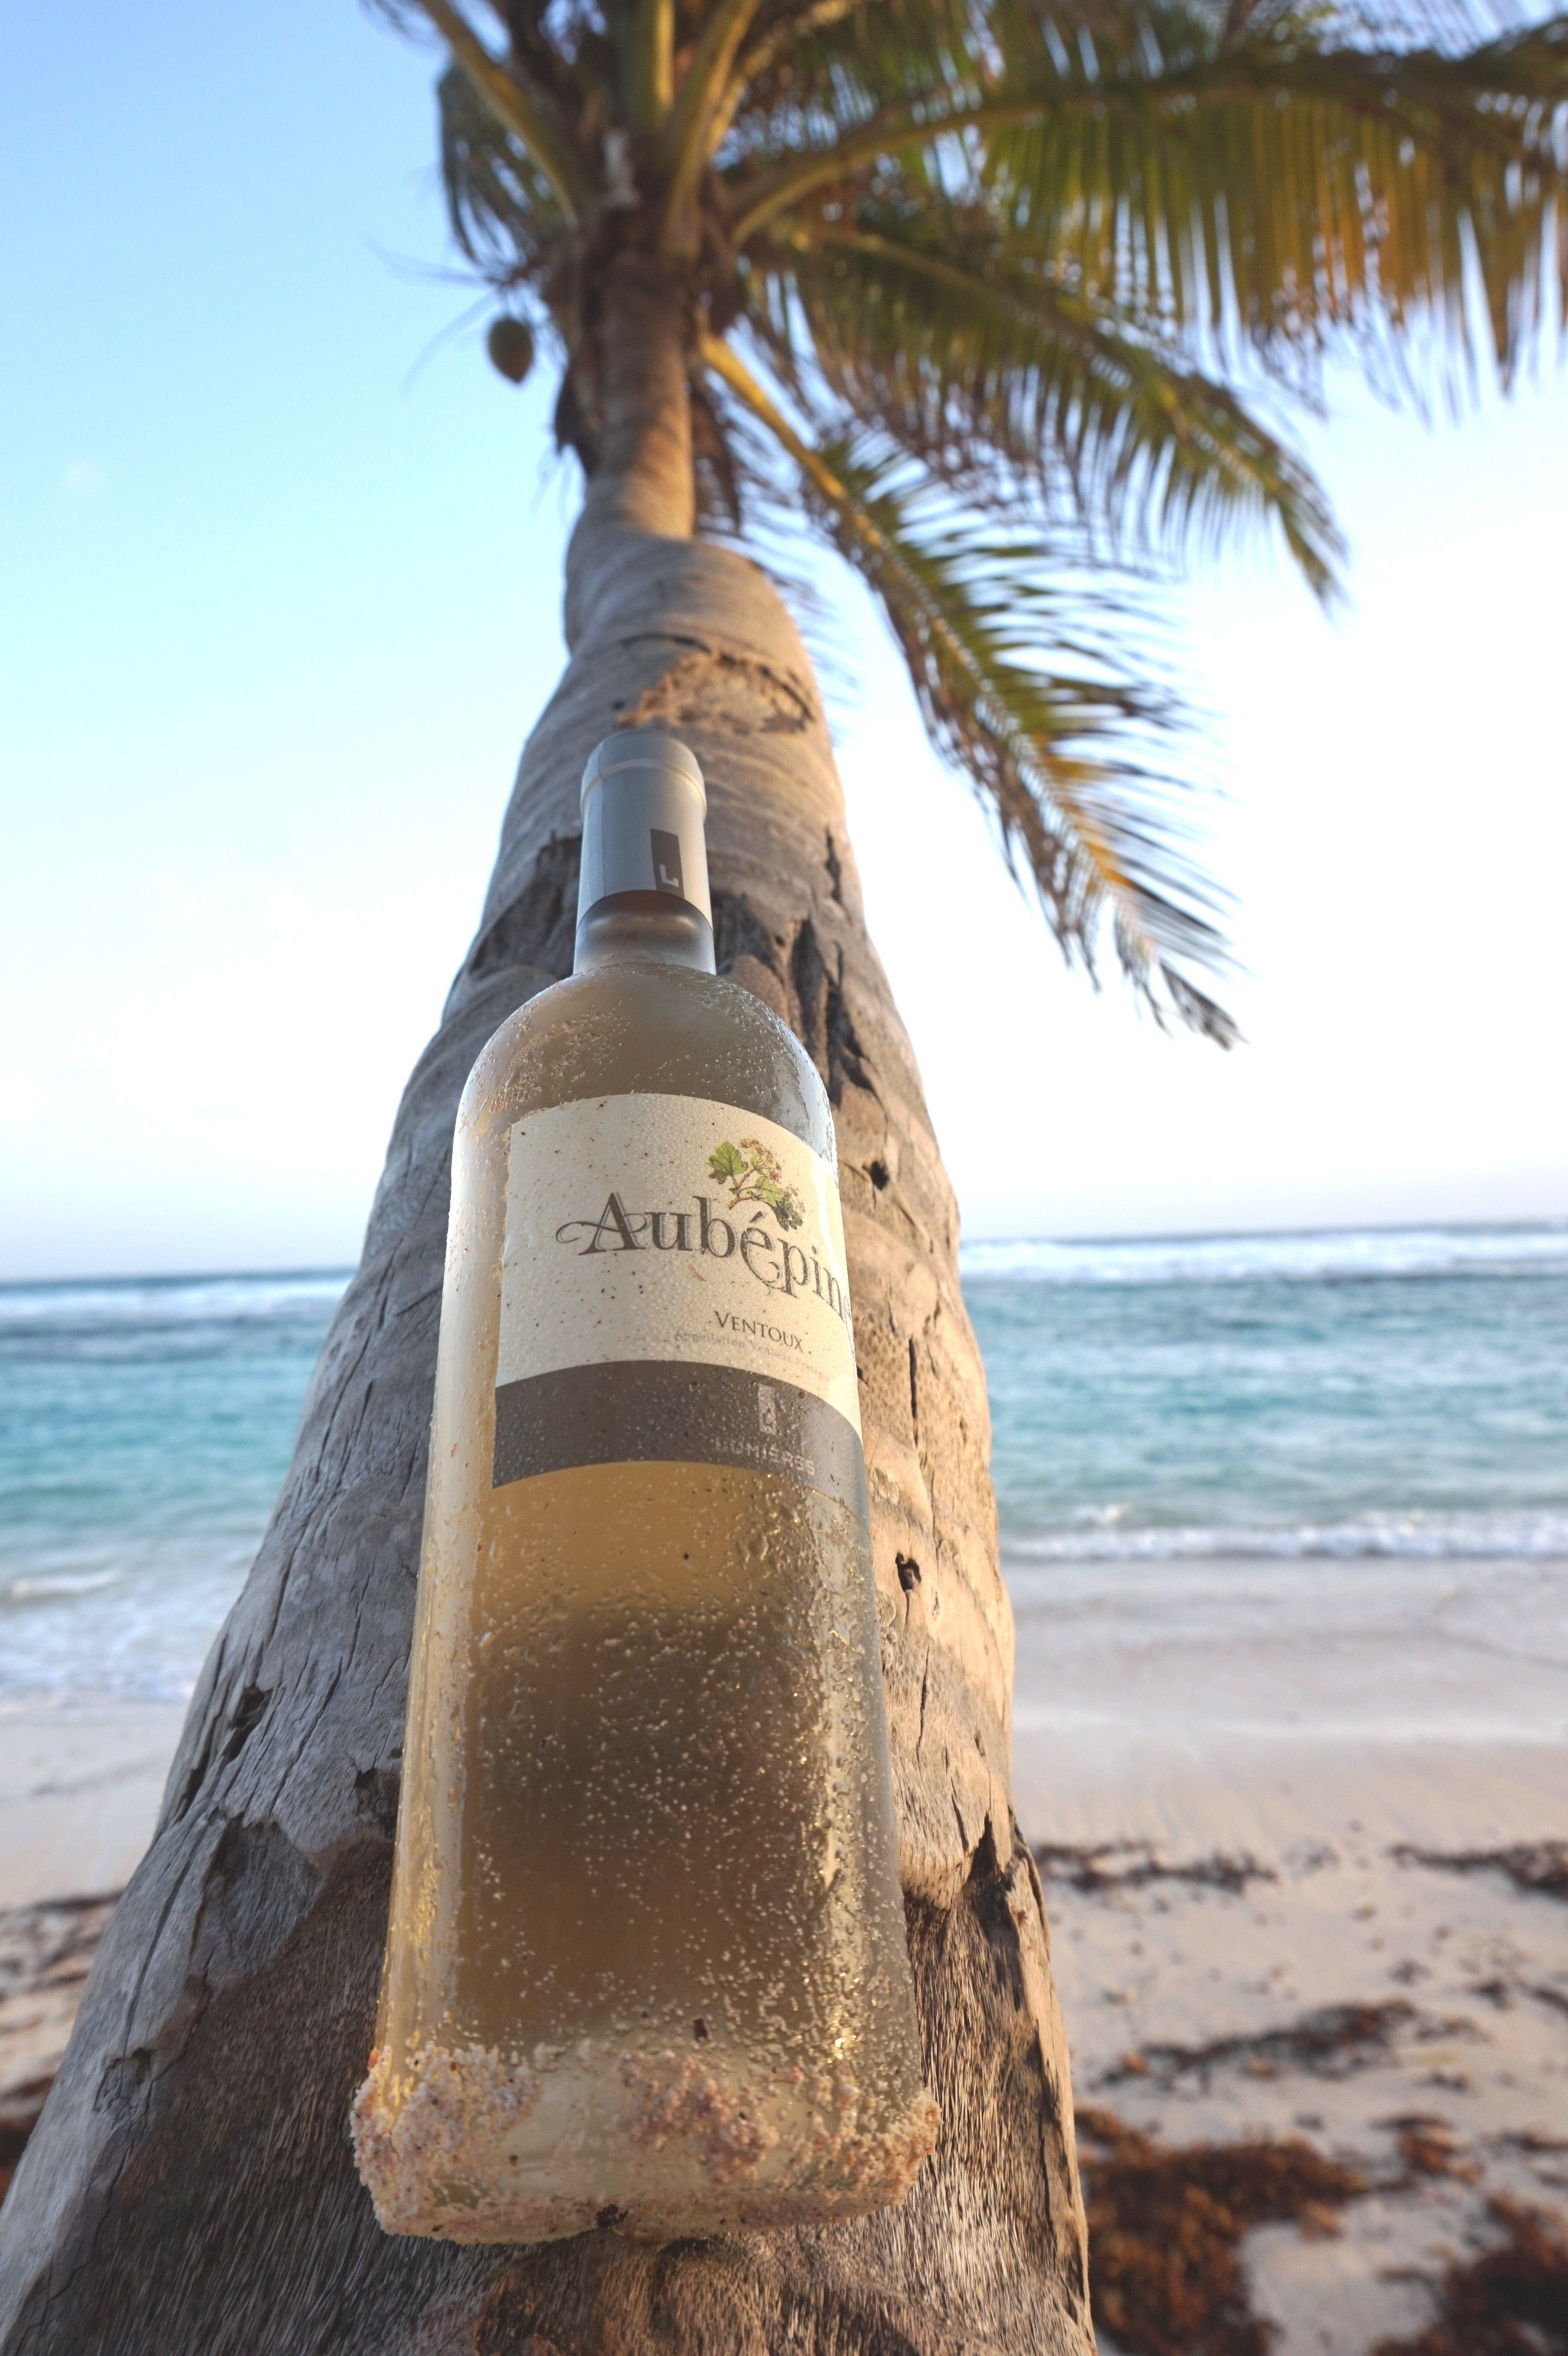 #cavedelumieres #aubepine #vin #blanc~#mariegalante #Martinique #sun #plage